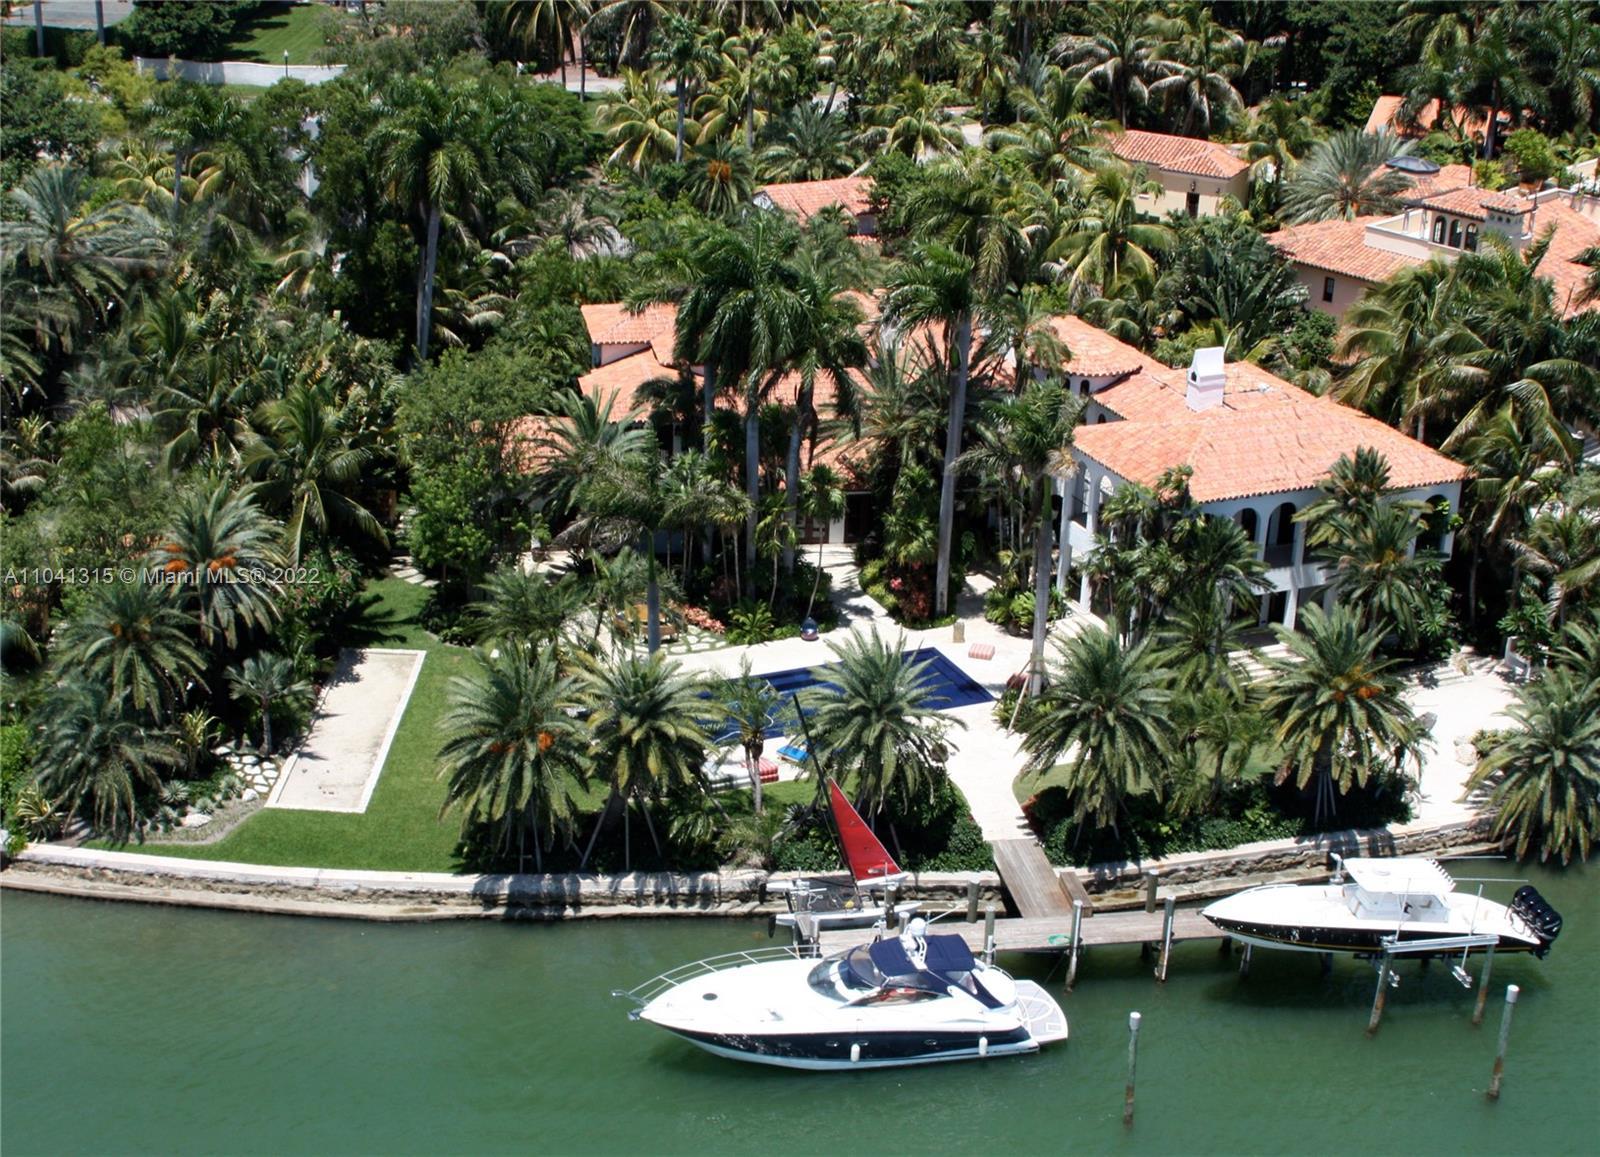 16 Palm Ave, Miami Beach FL 33139